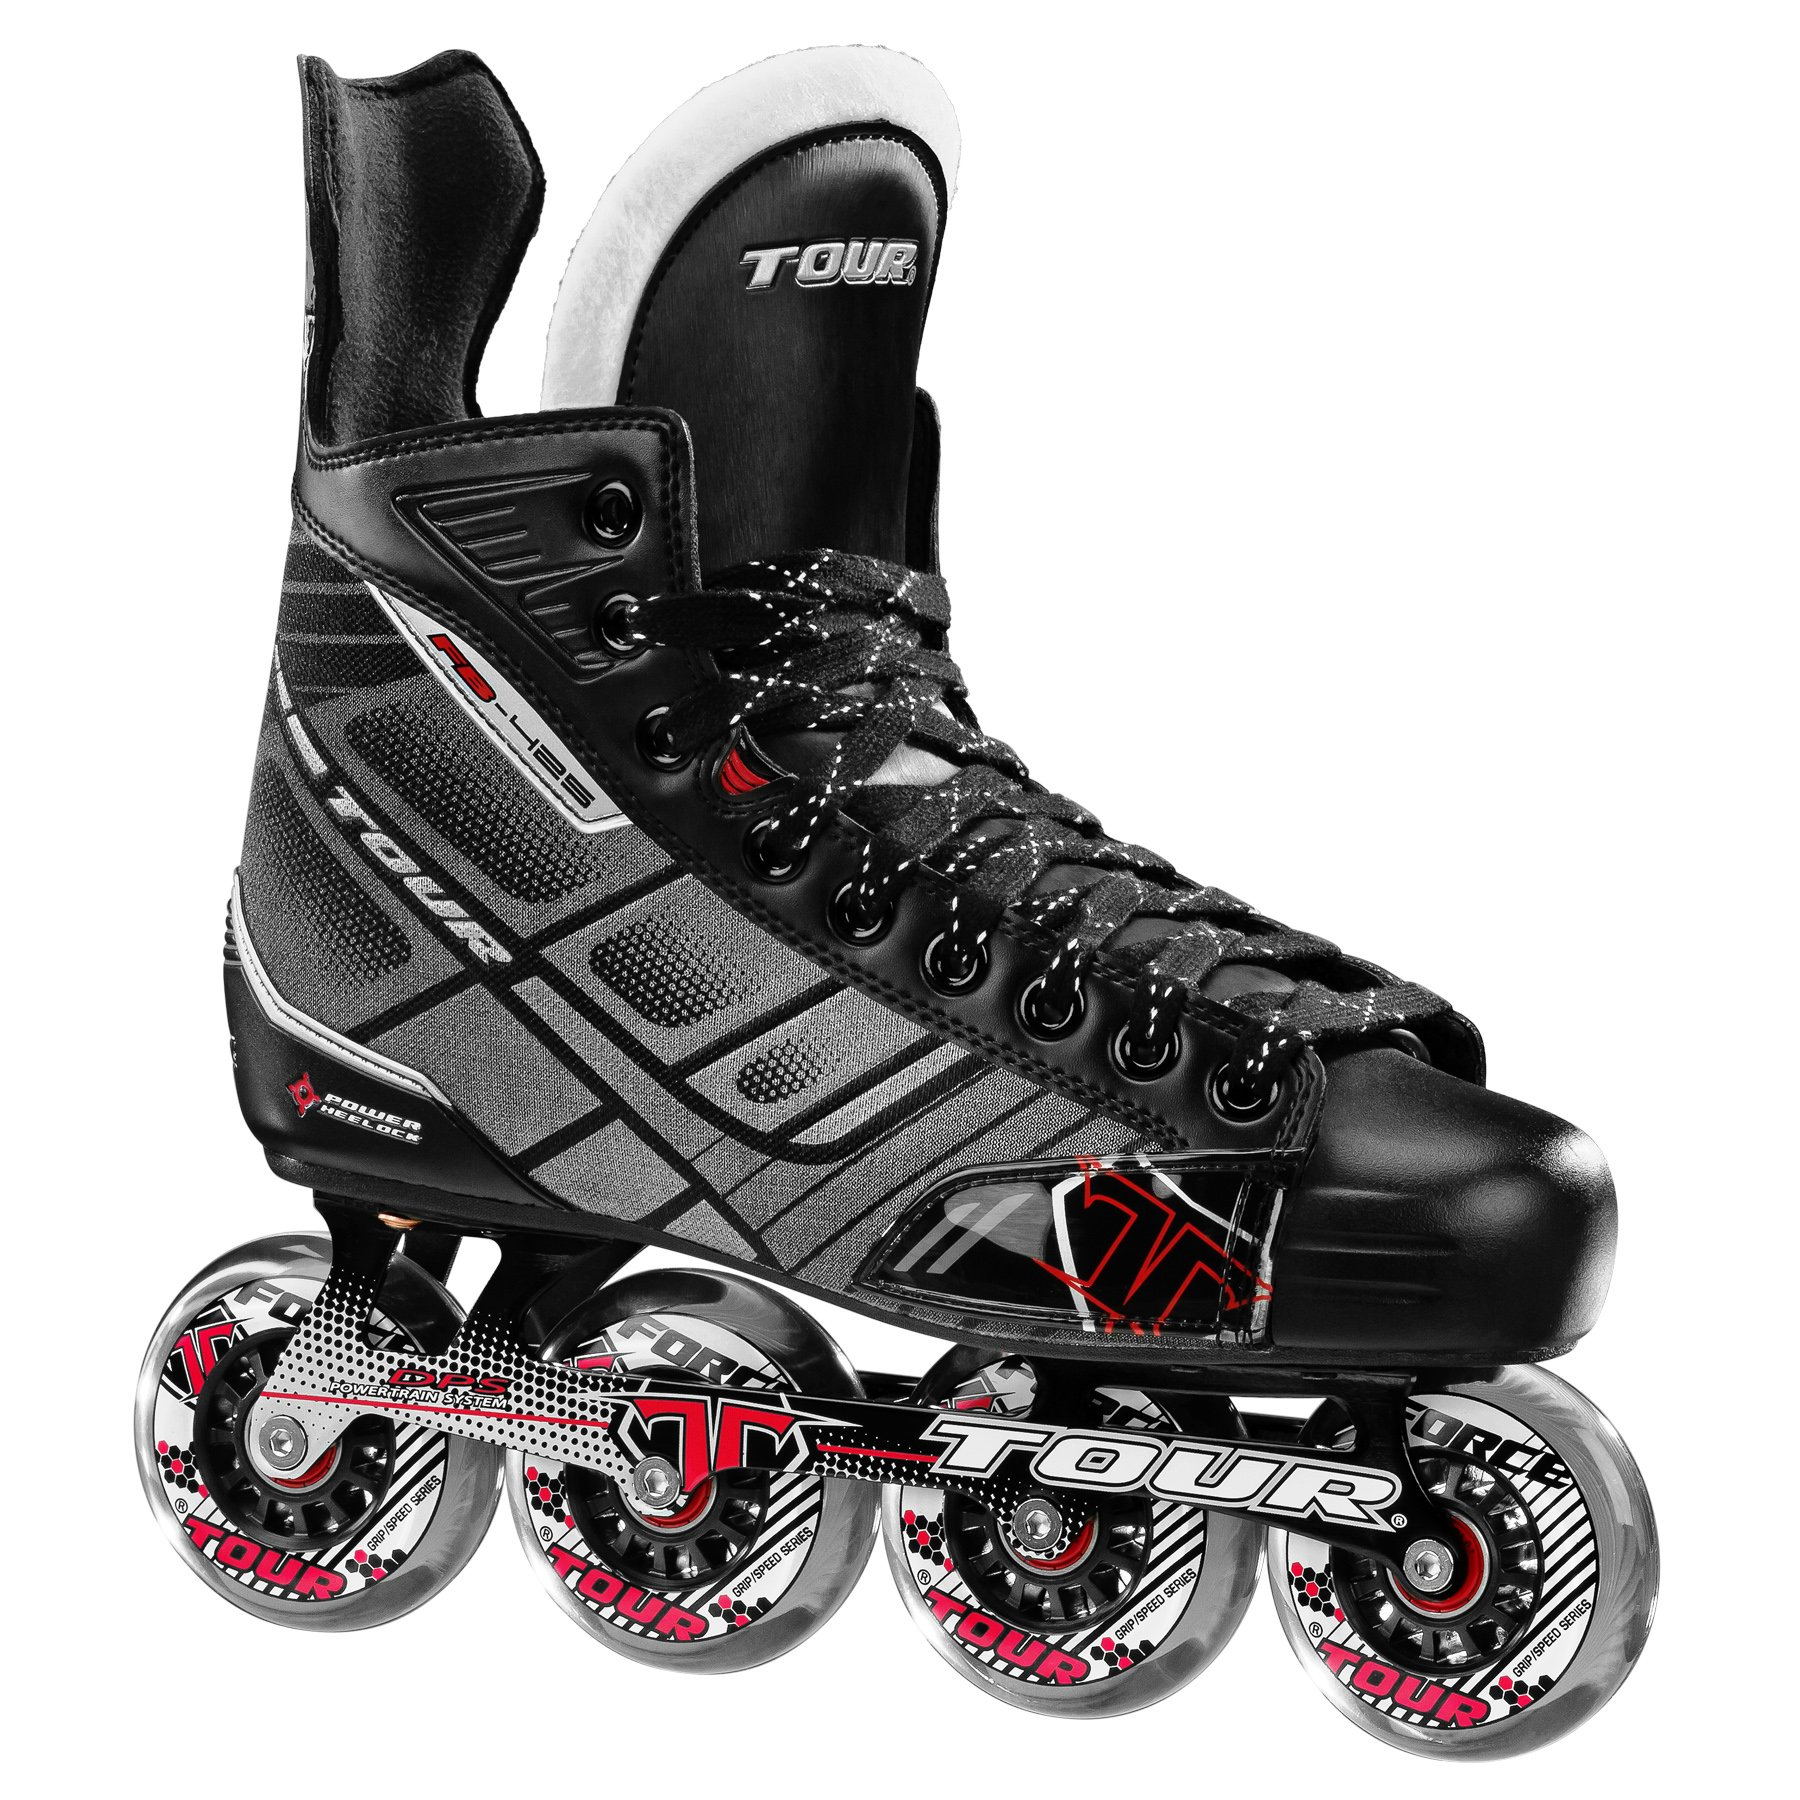 Tour Hockey 63TA-03 BONELITE 425 Inline Hockey Skate by Tour Hockey